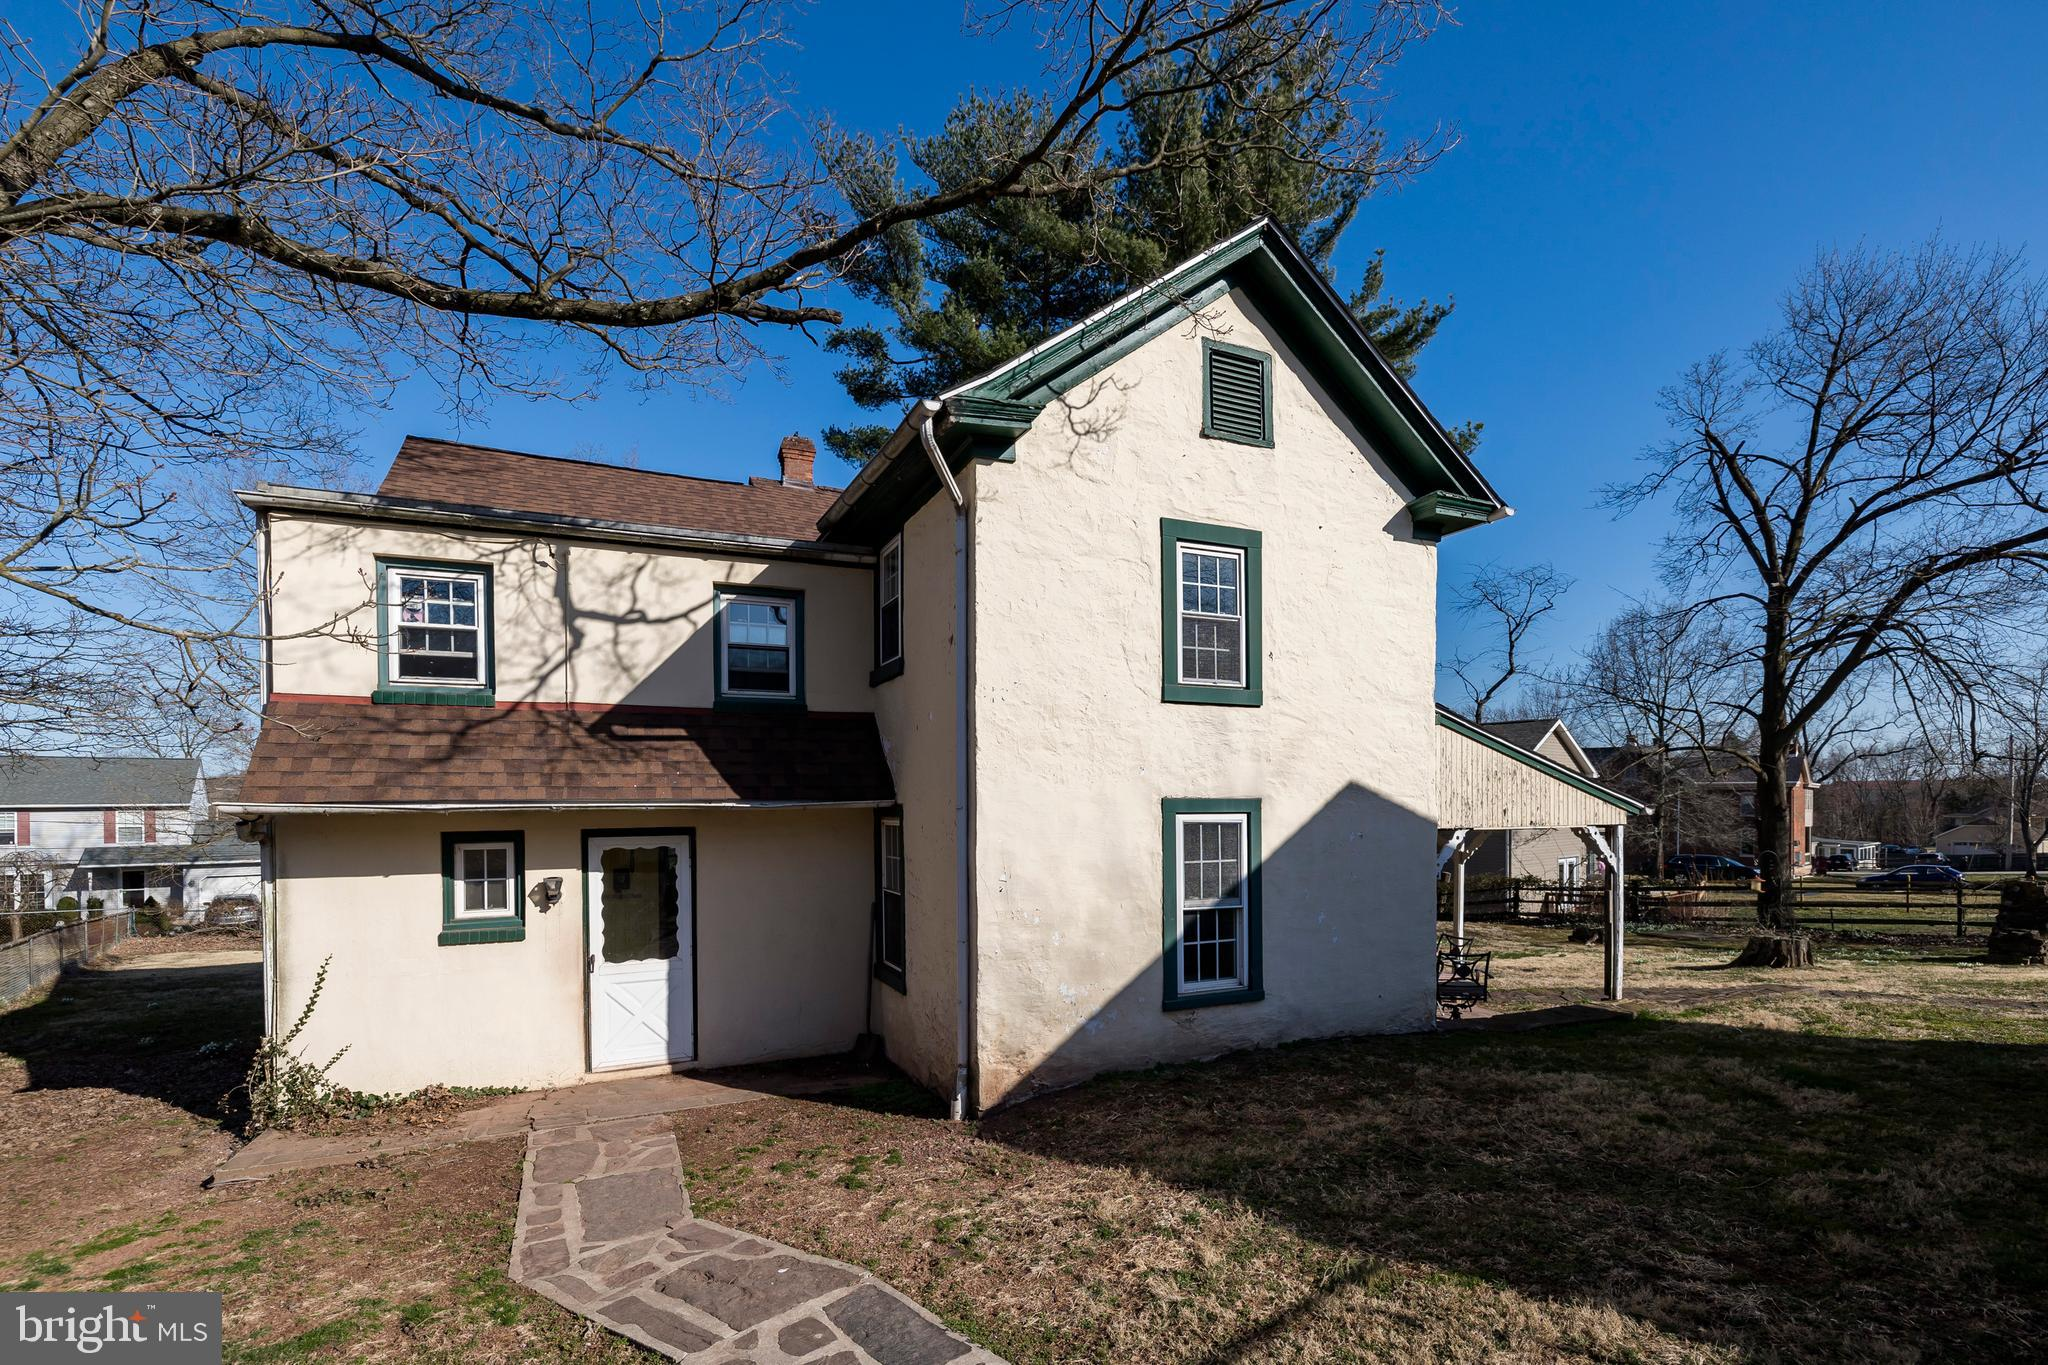 115 CENTENNIAL STREET, COLLEGEVILLE, Pennsylvania 19426, 4 Bedrooms Bedrooms, ,2 BathroomsBathrooms,Single Family,For Sale,115 CENTENNIAL STREET,PAMC686788